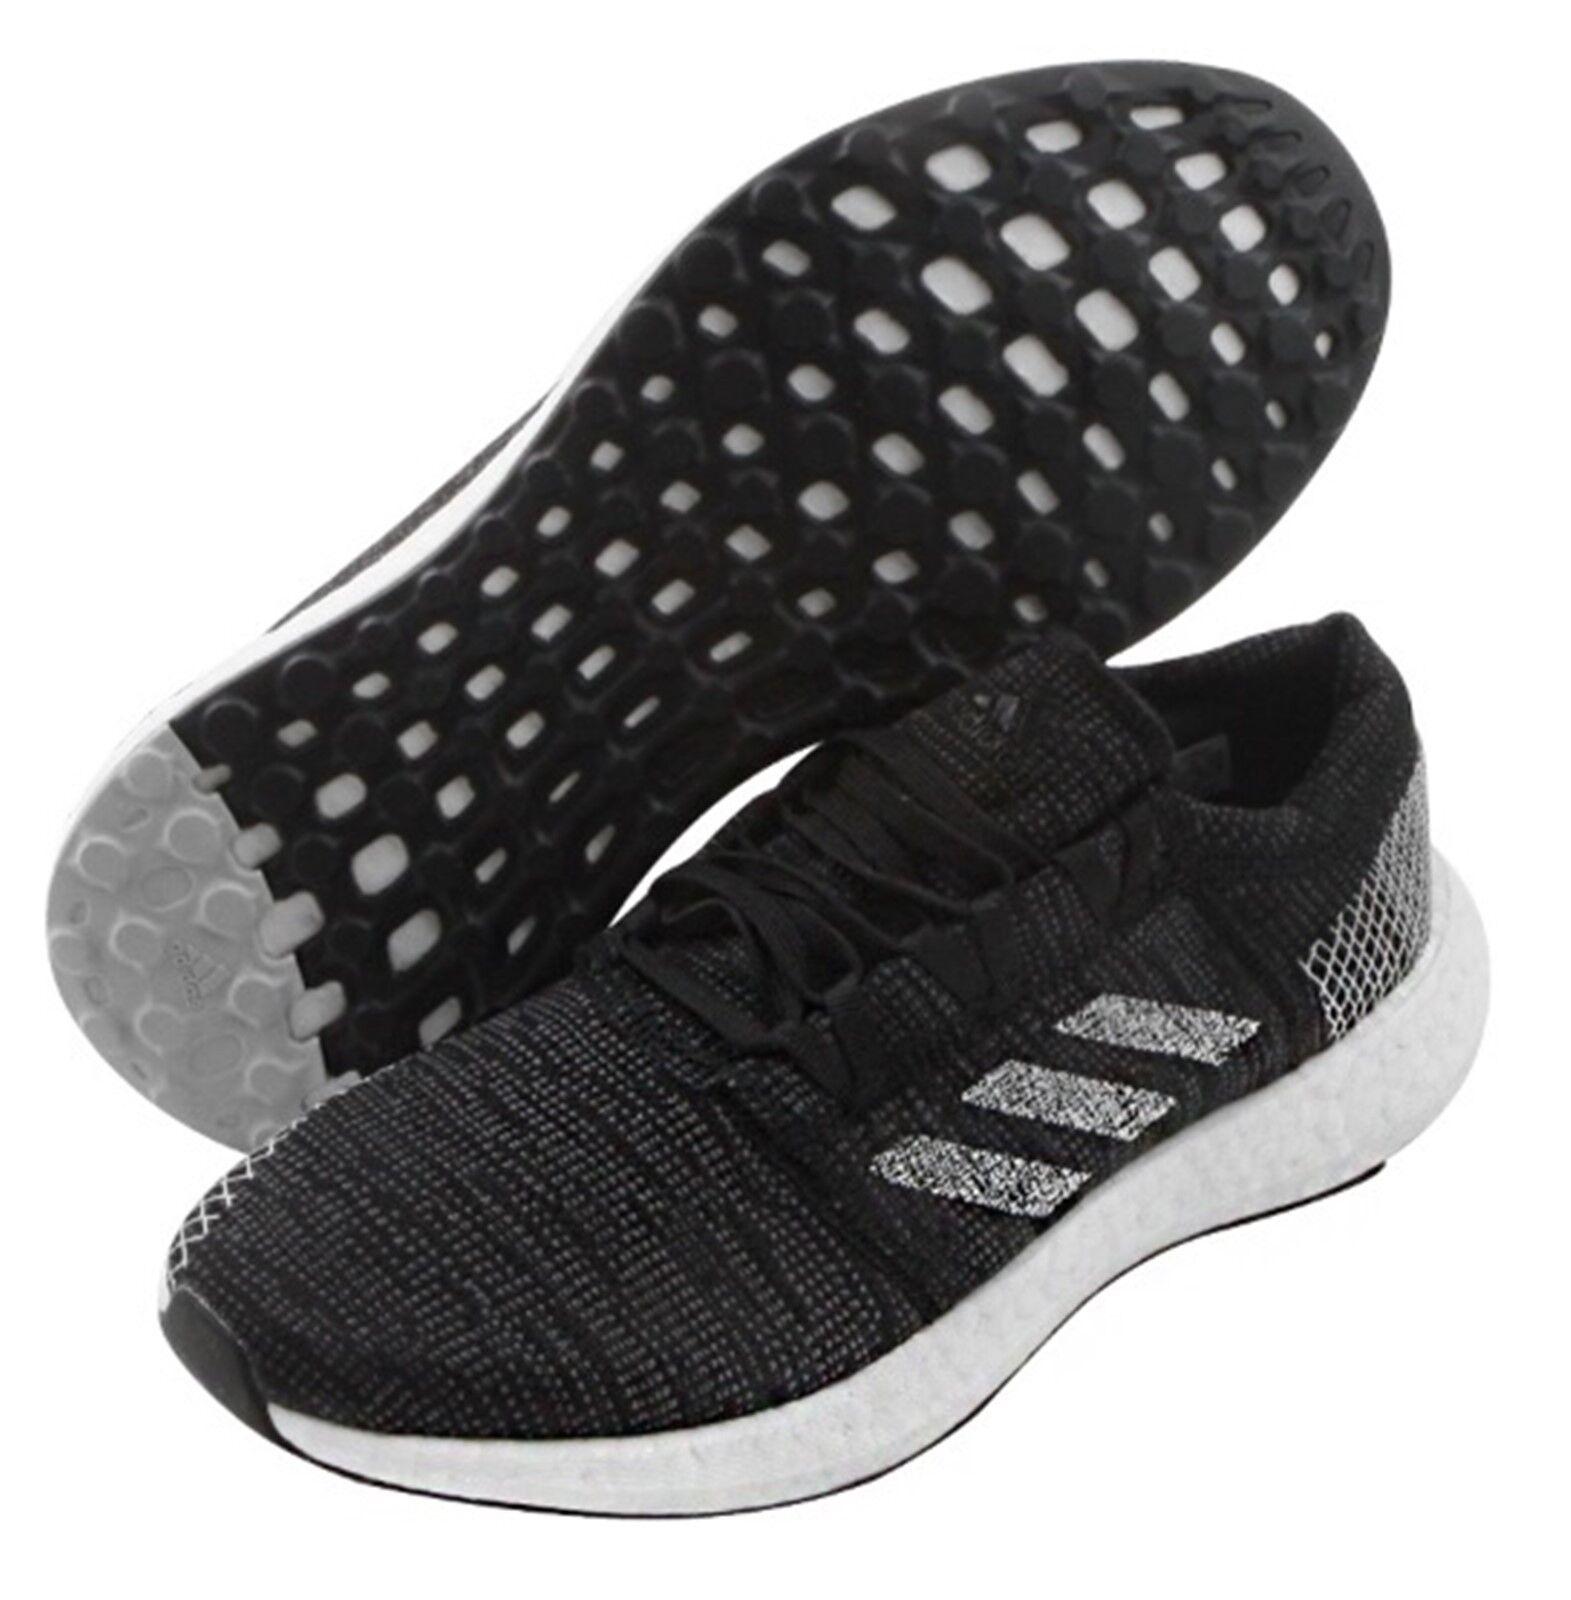 Adidas, zapatos deportivos negros, botas deportivas, b37803.